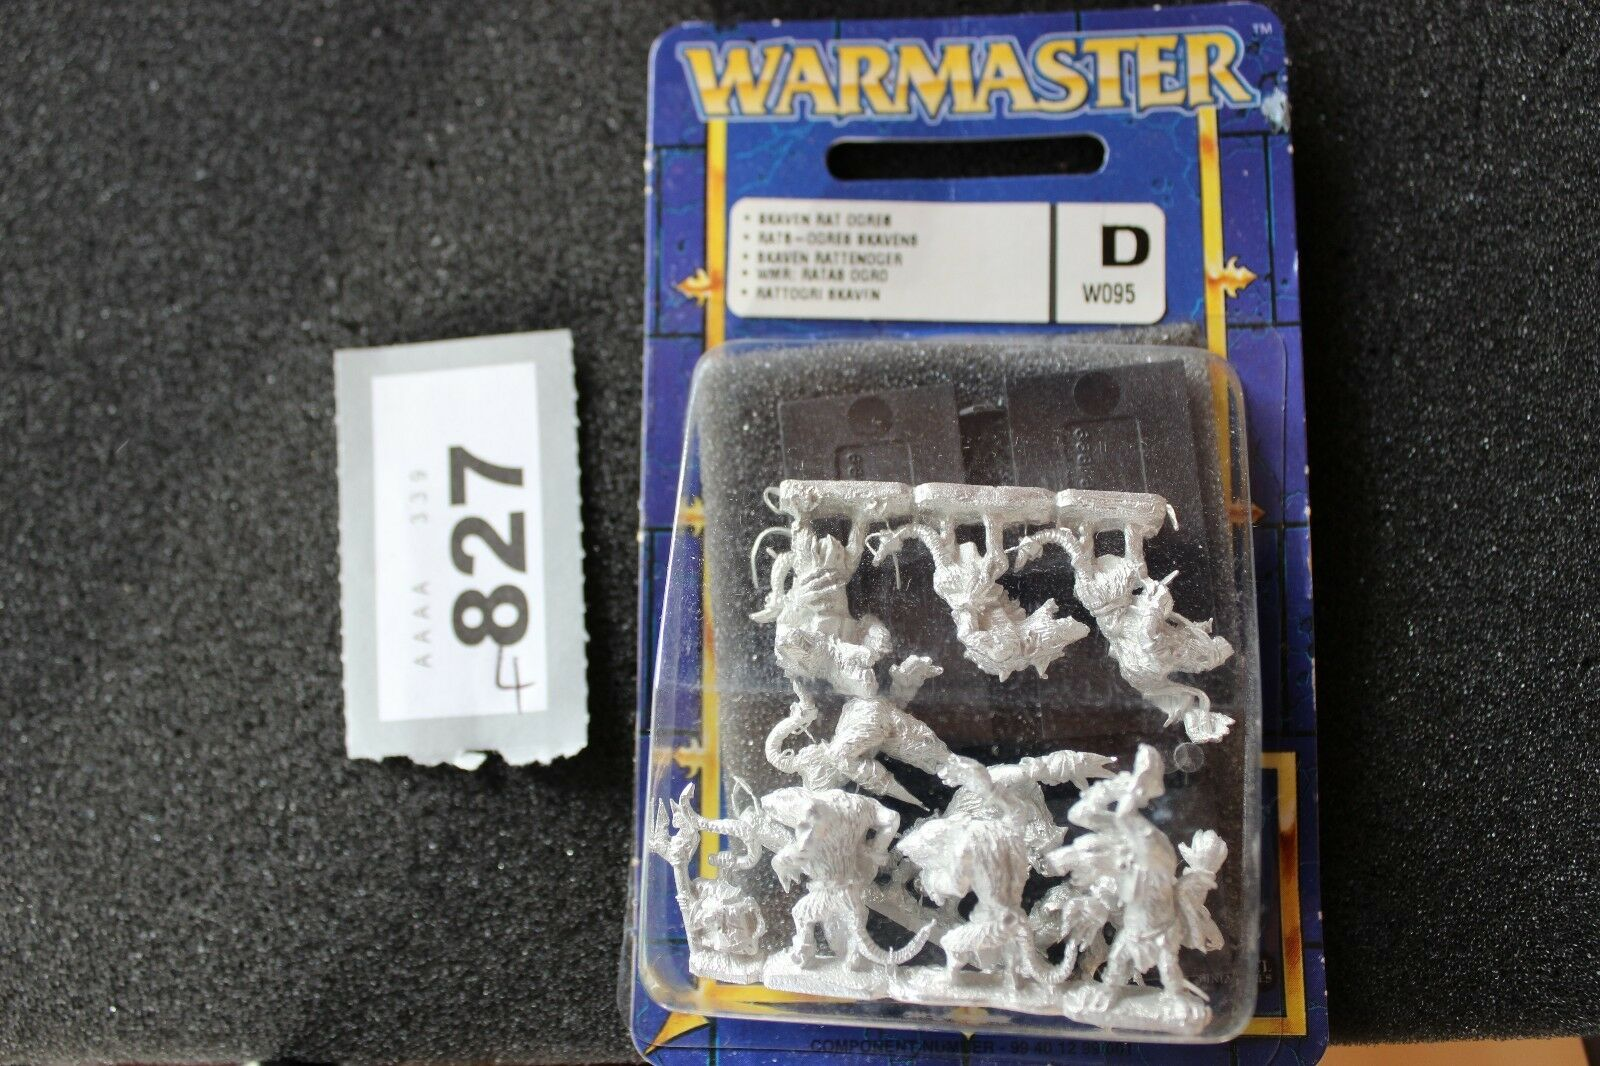 Games Workshop Warmaster Rat Ogres Skaven BNIB New Sealed Metal 10mm Miniatures